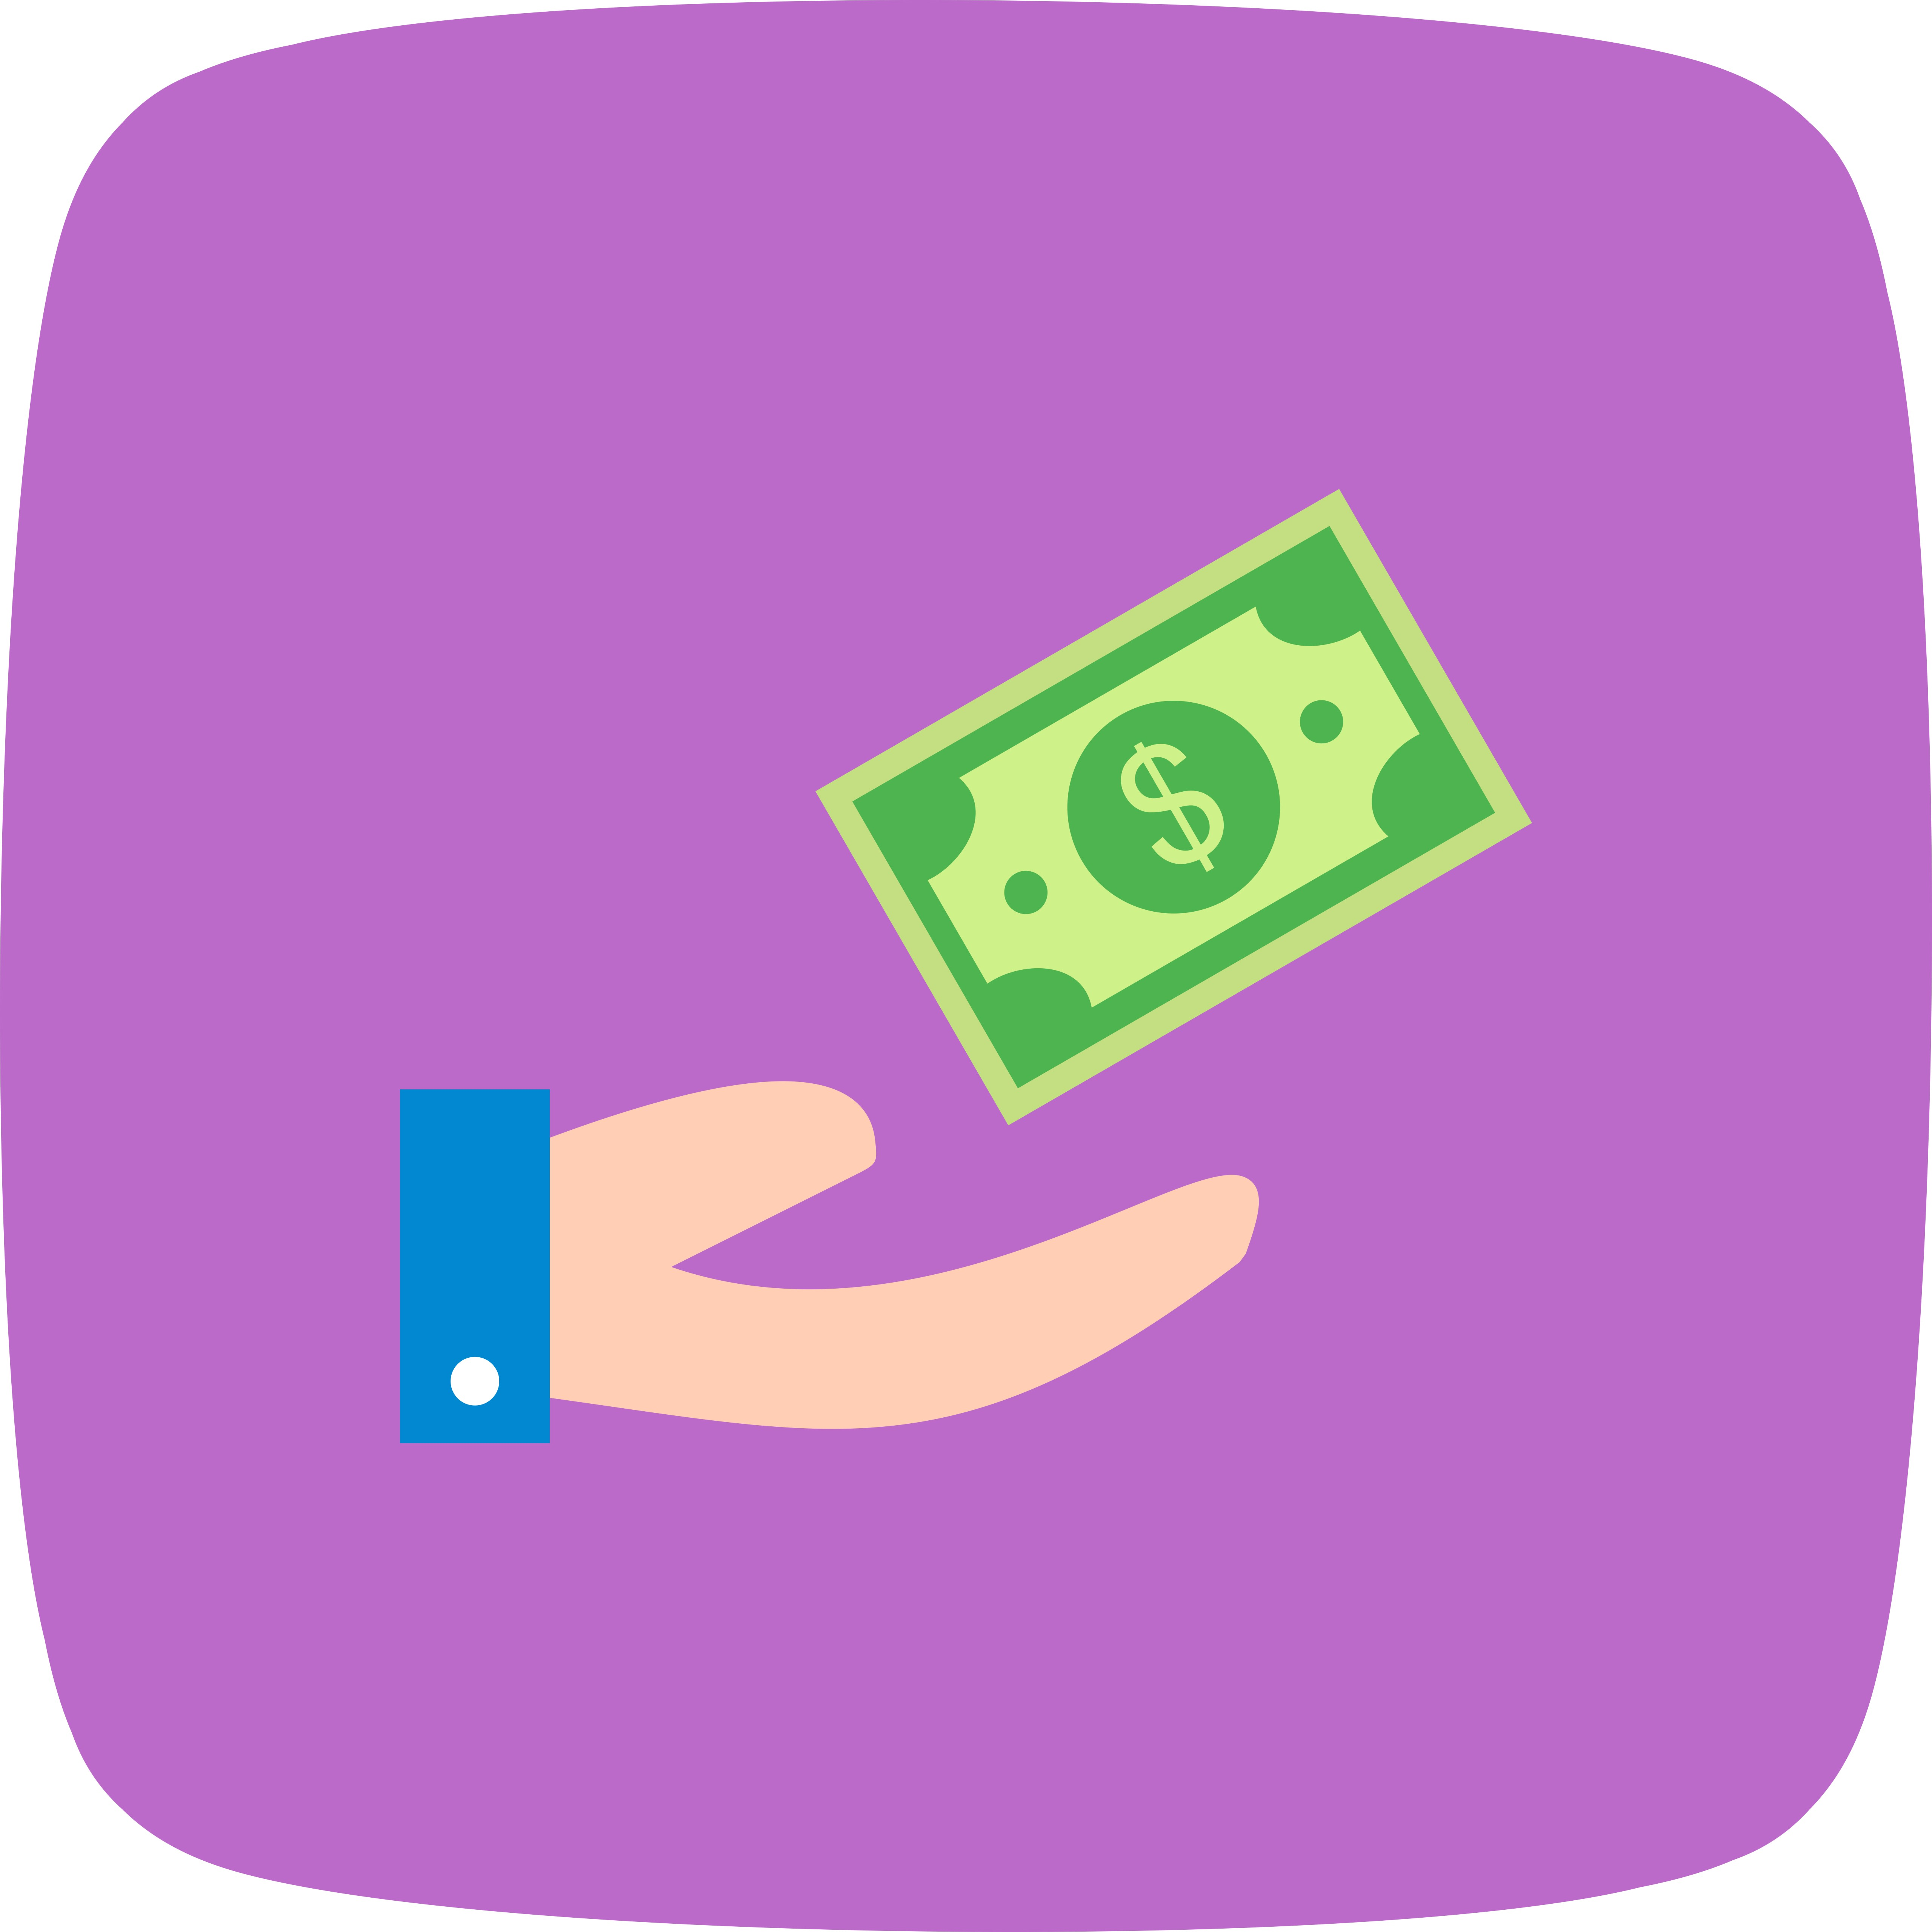 Loan Vector Icon - Download Free Vectors, Clipart Graphics ...